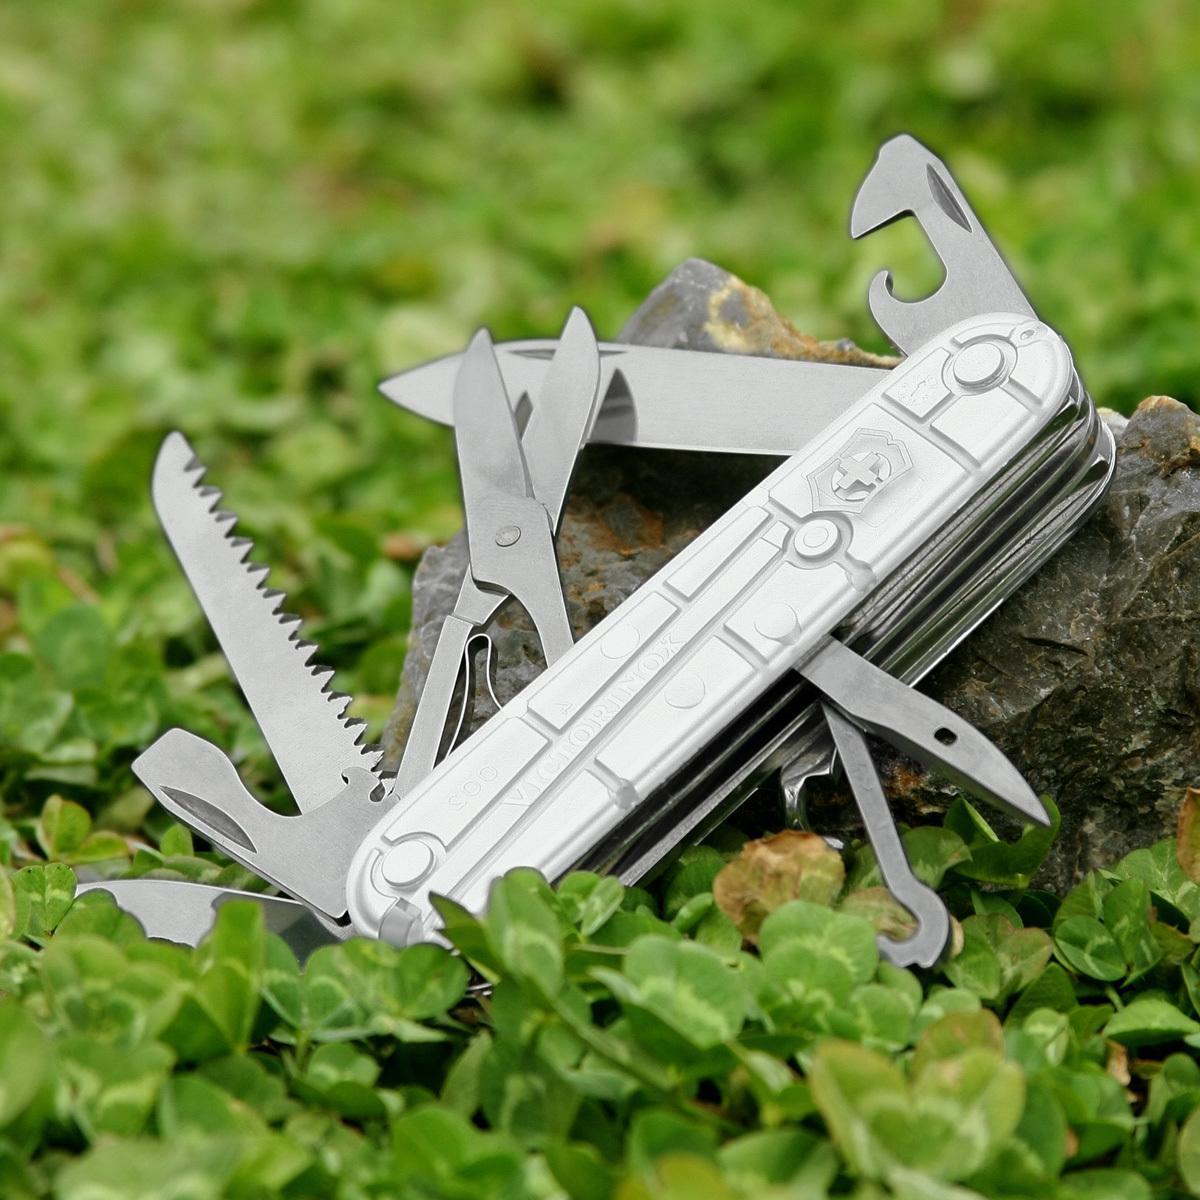 Huntsman SilverTech Victorinox (1.3713.T7)